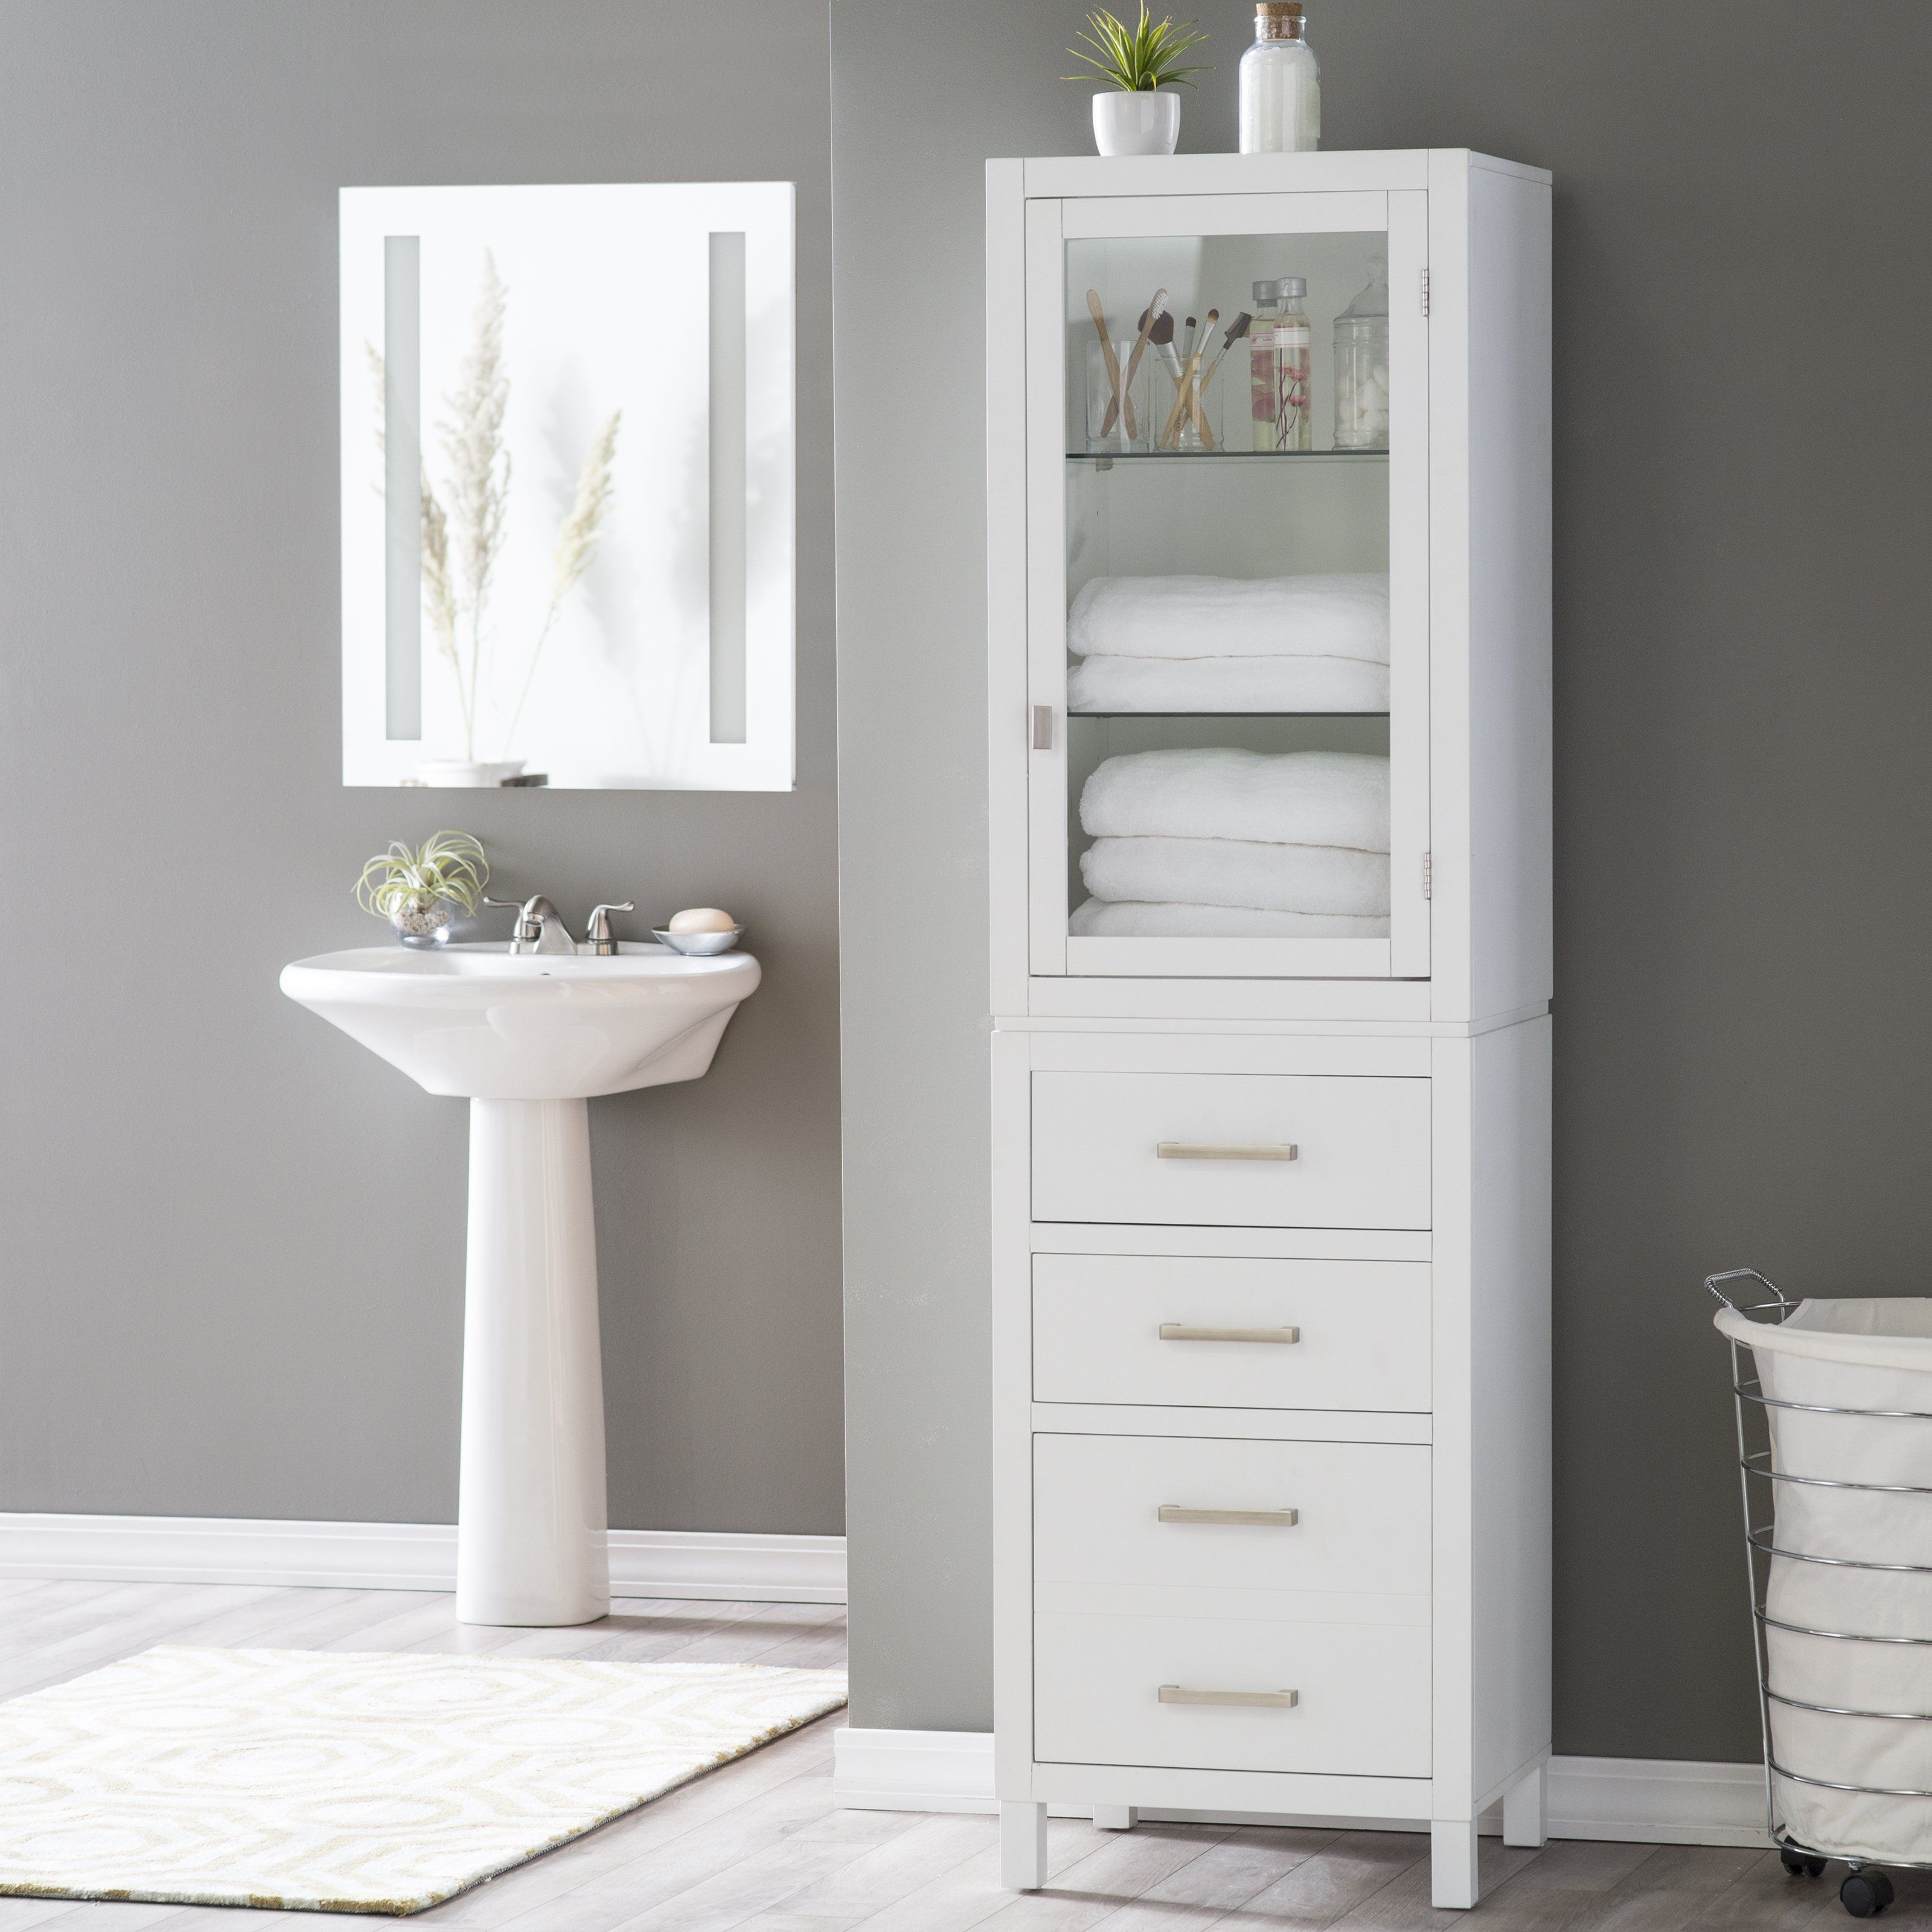 Elegant Bathroom Interesting Bathroom Storage Furniture throughout measurements 3200 X 3200